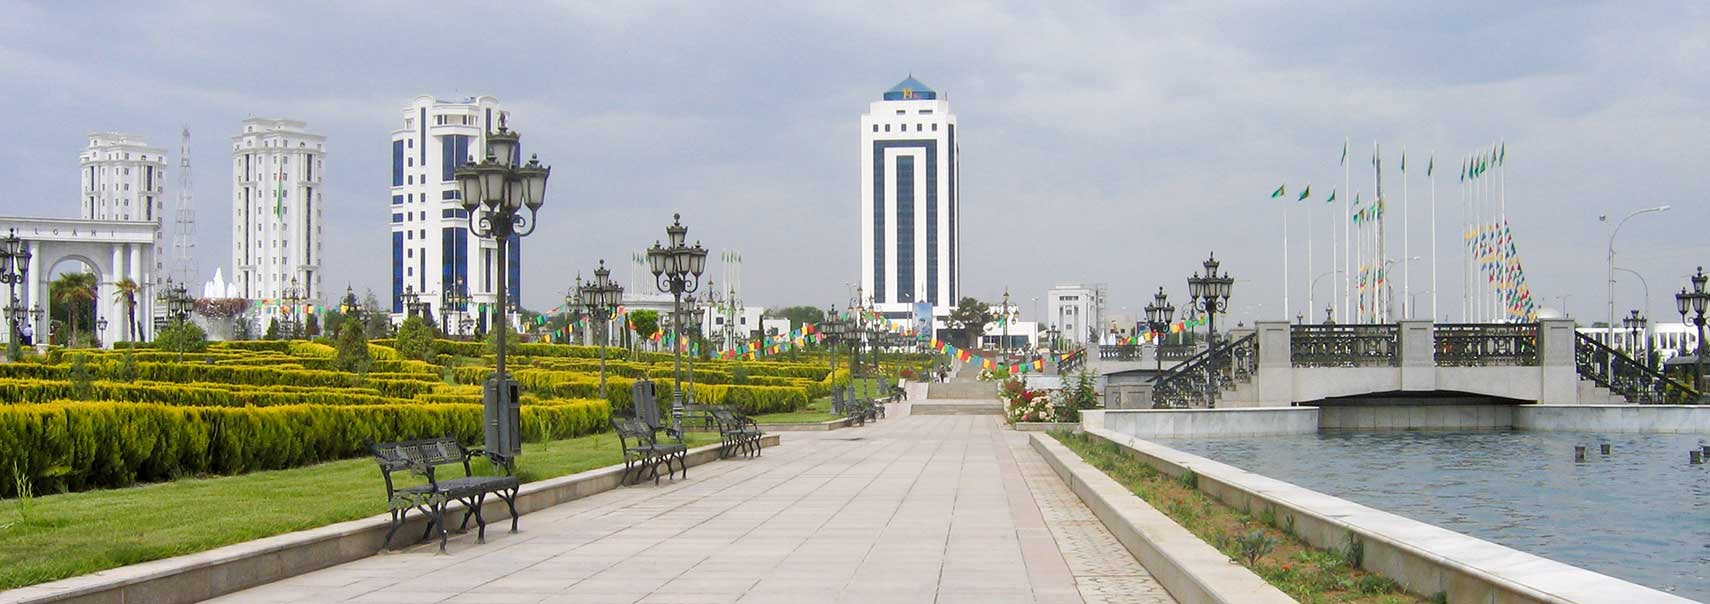 Ashgabat city park